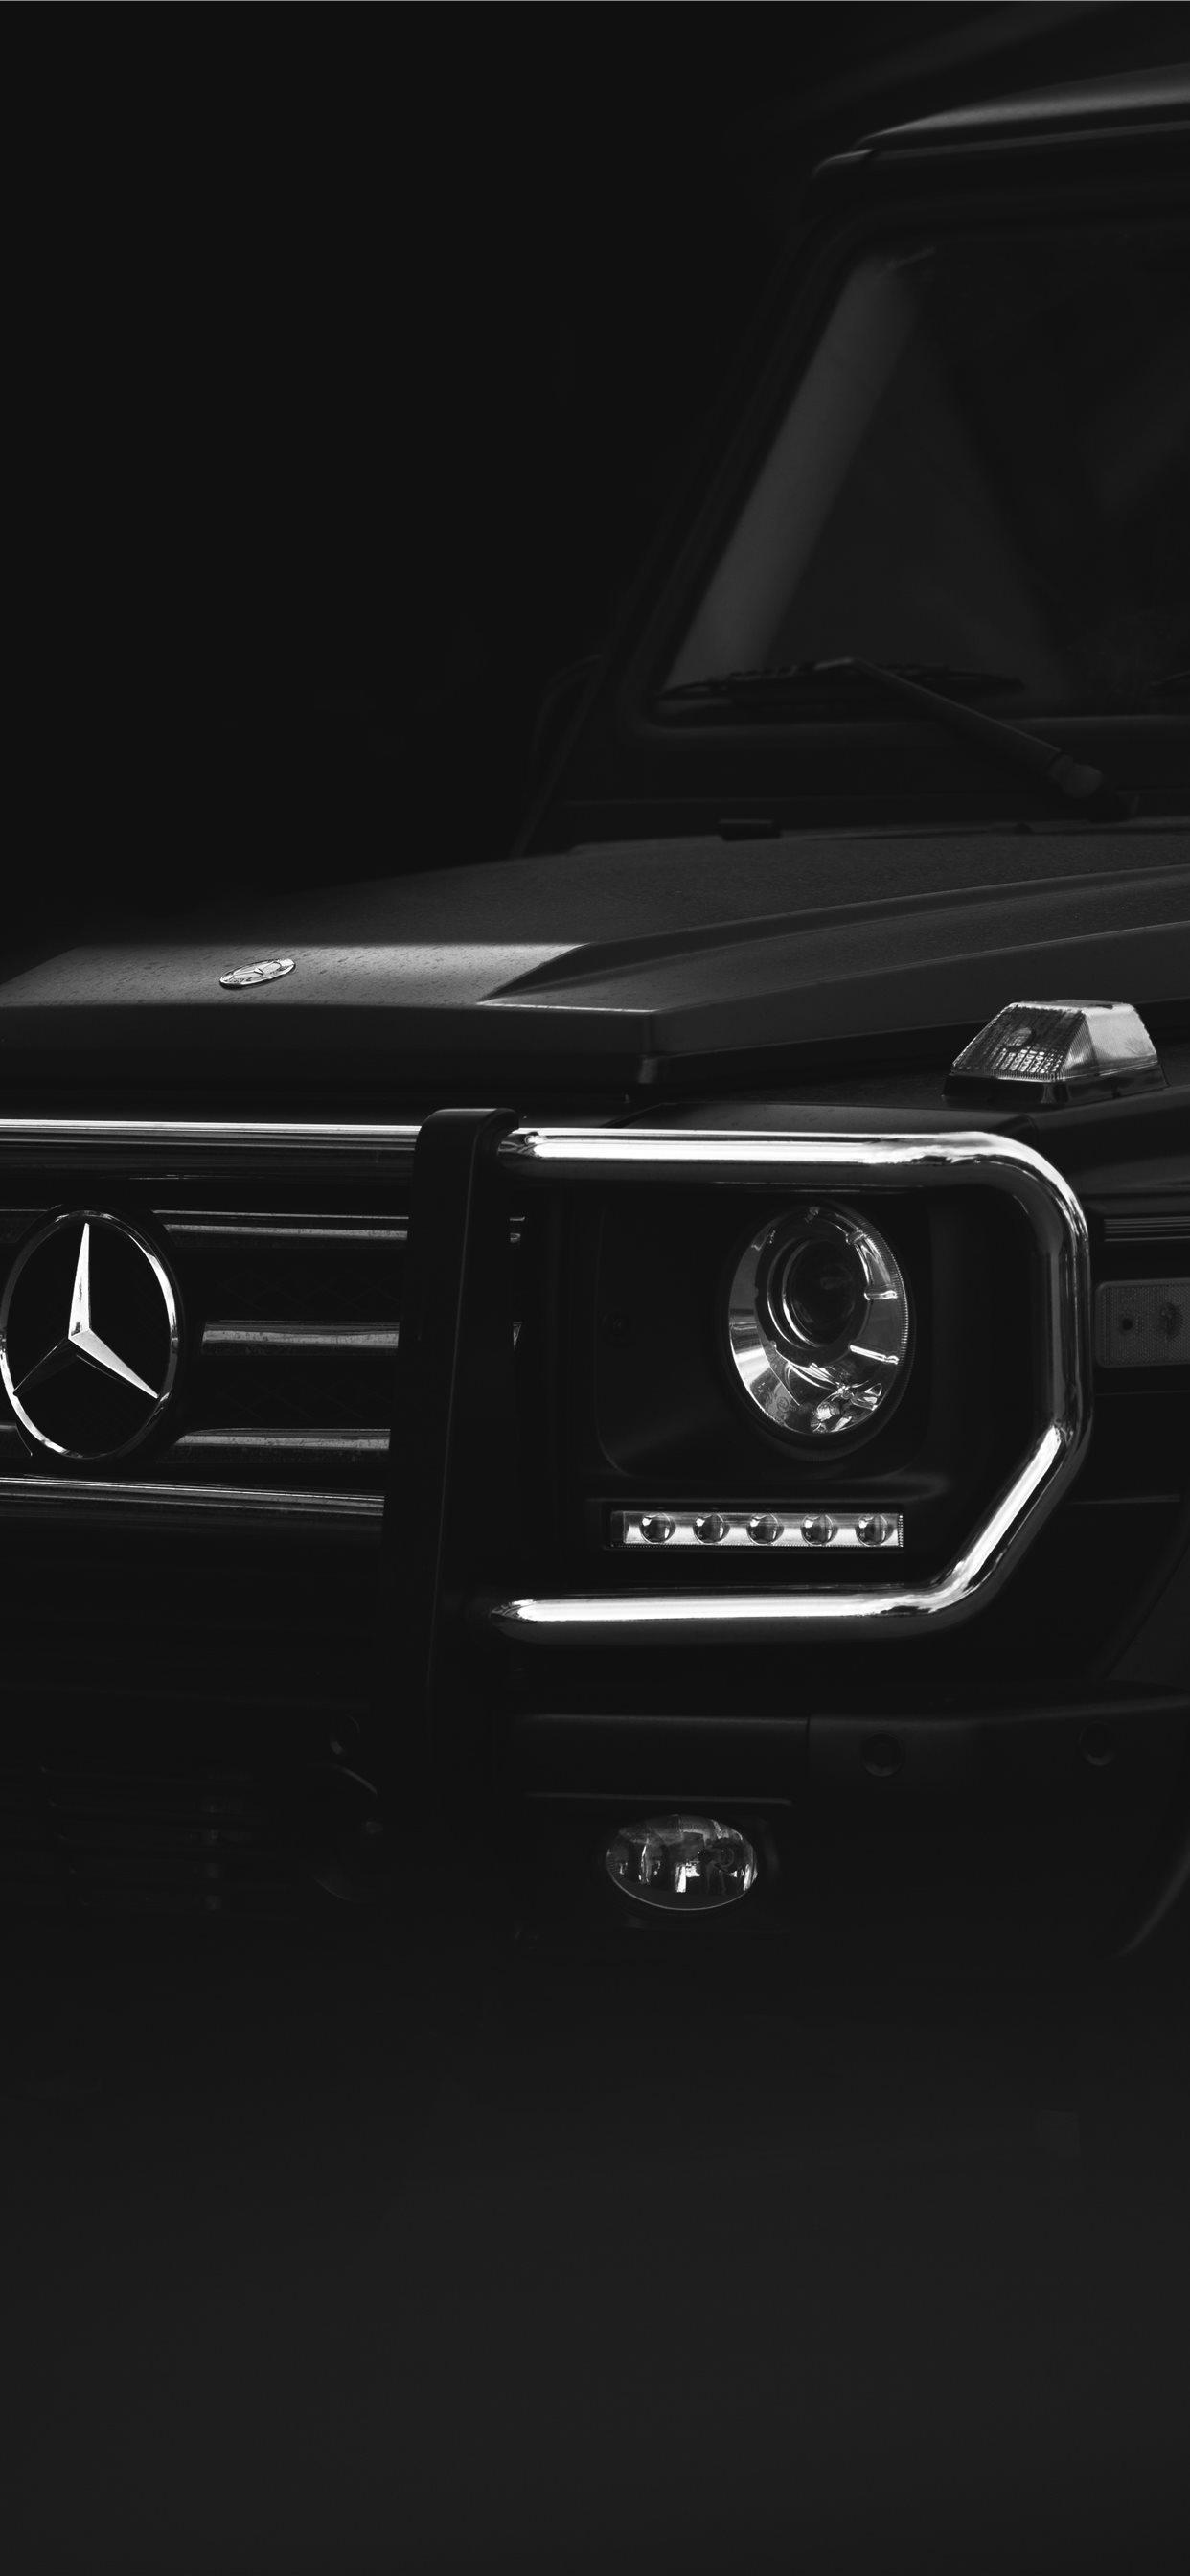 Black Mercedes Benz Car Iphone X Wallpapers Free Download